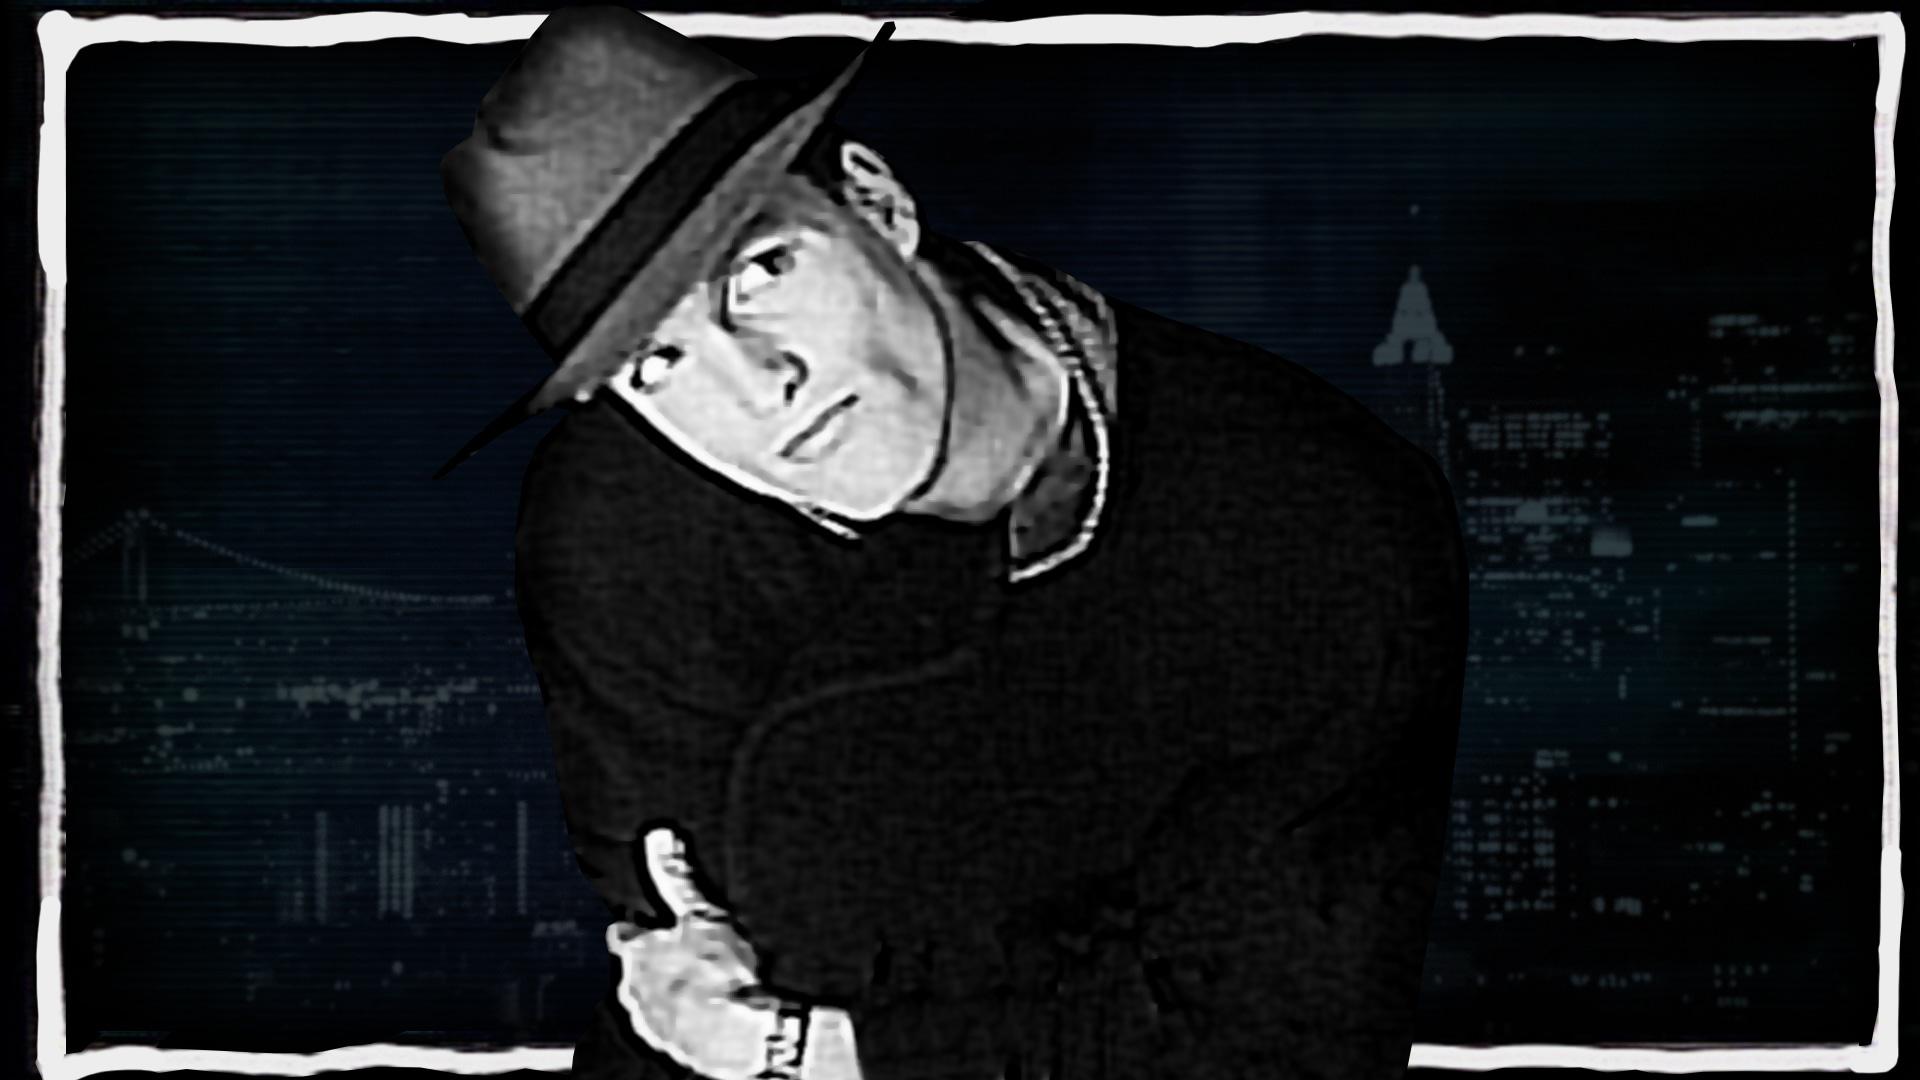 Woody Harrelson: November 18, 1989